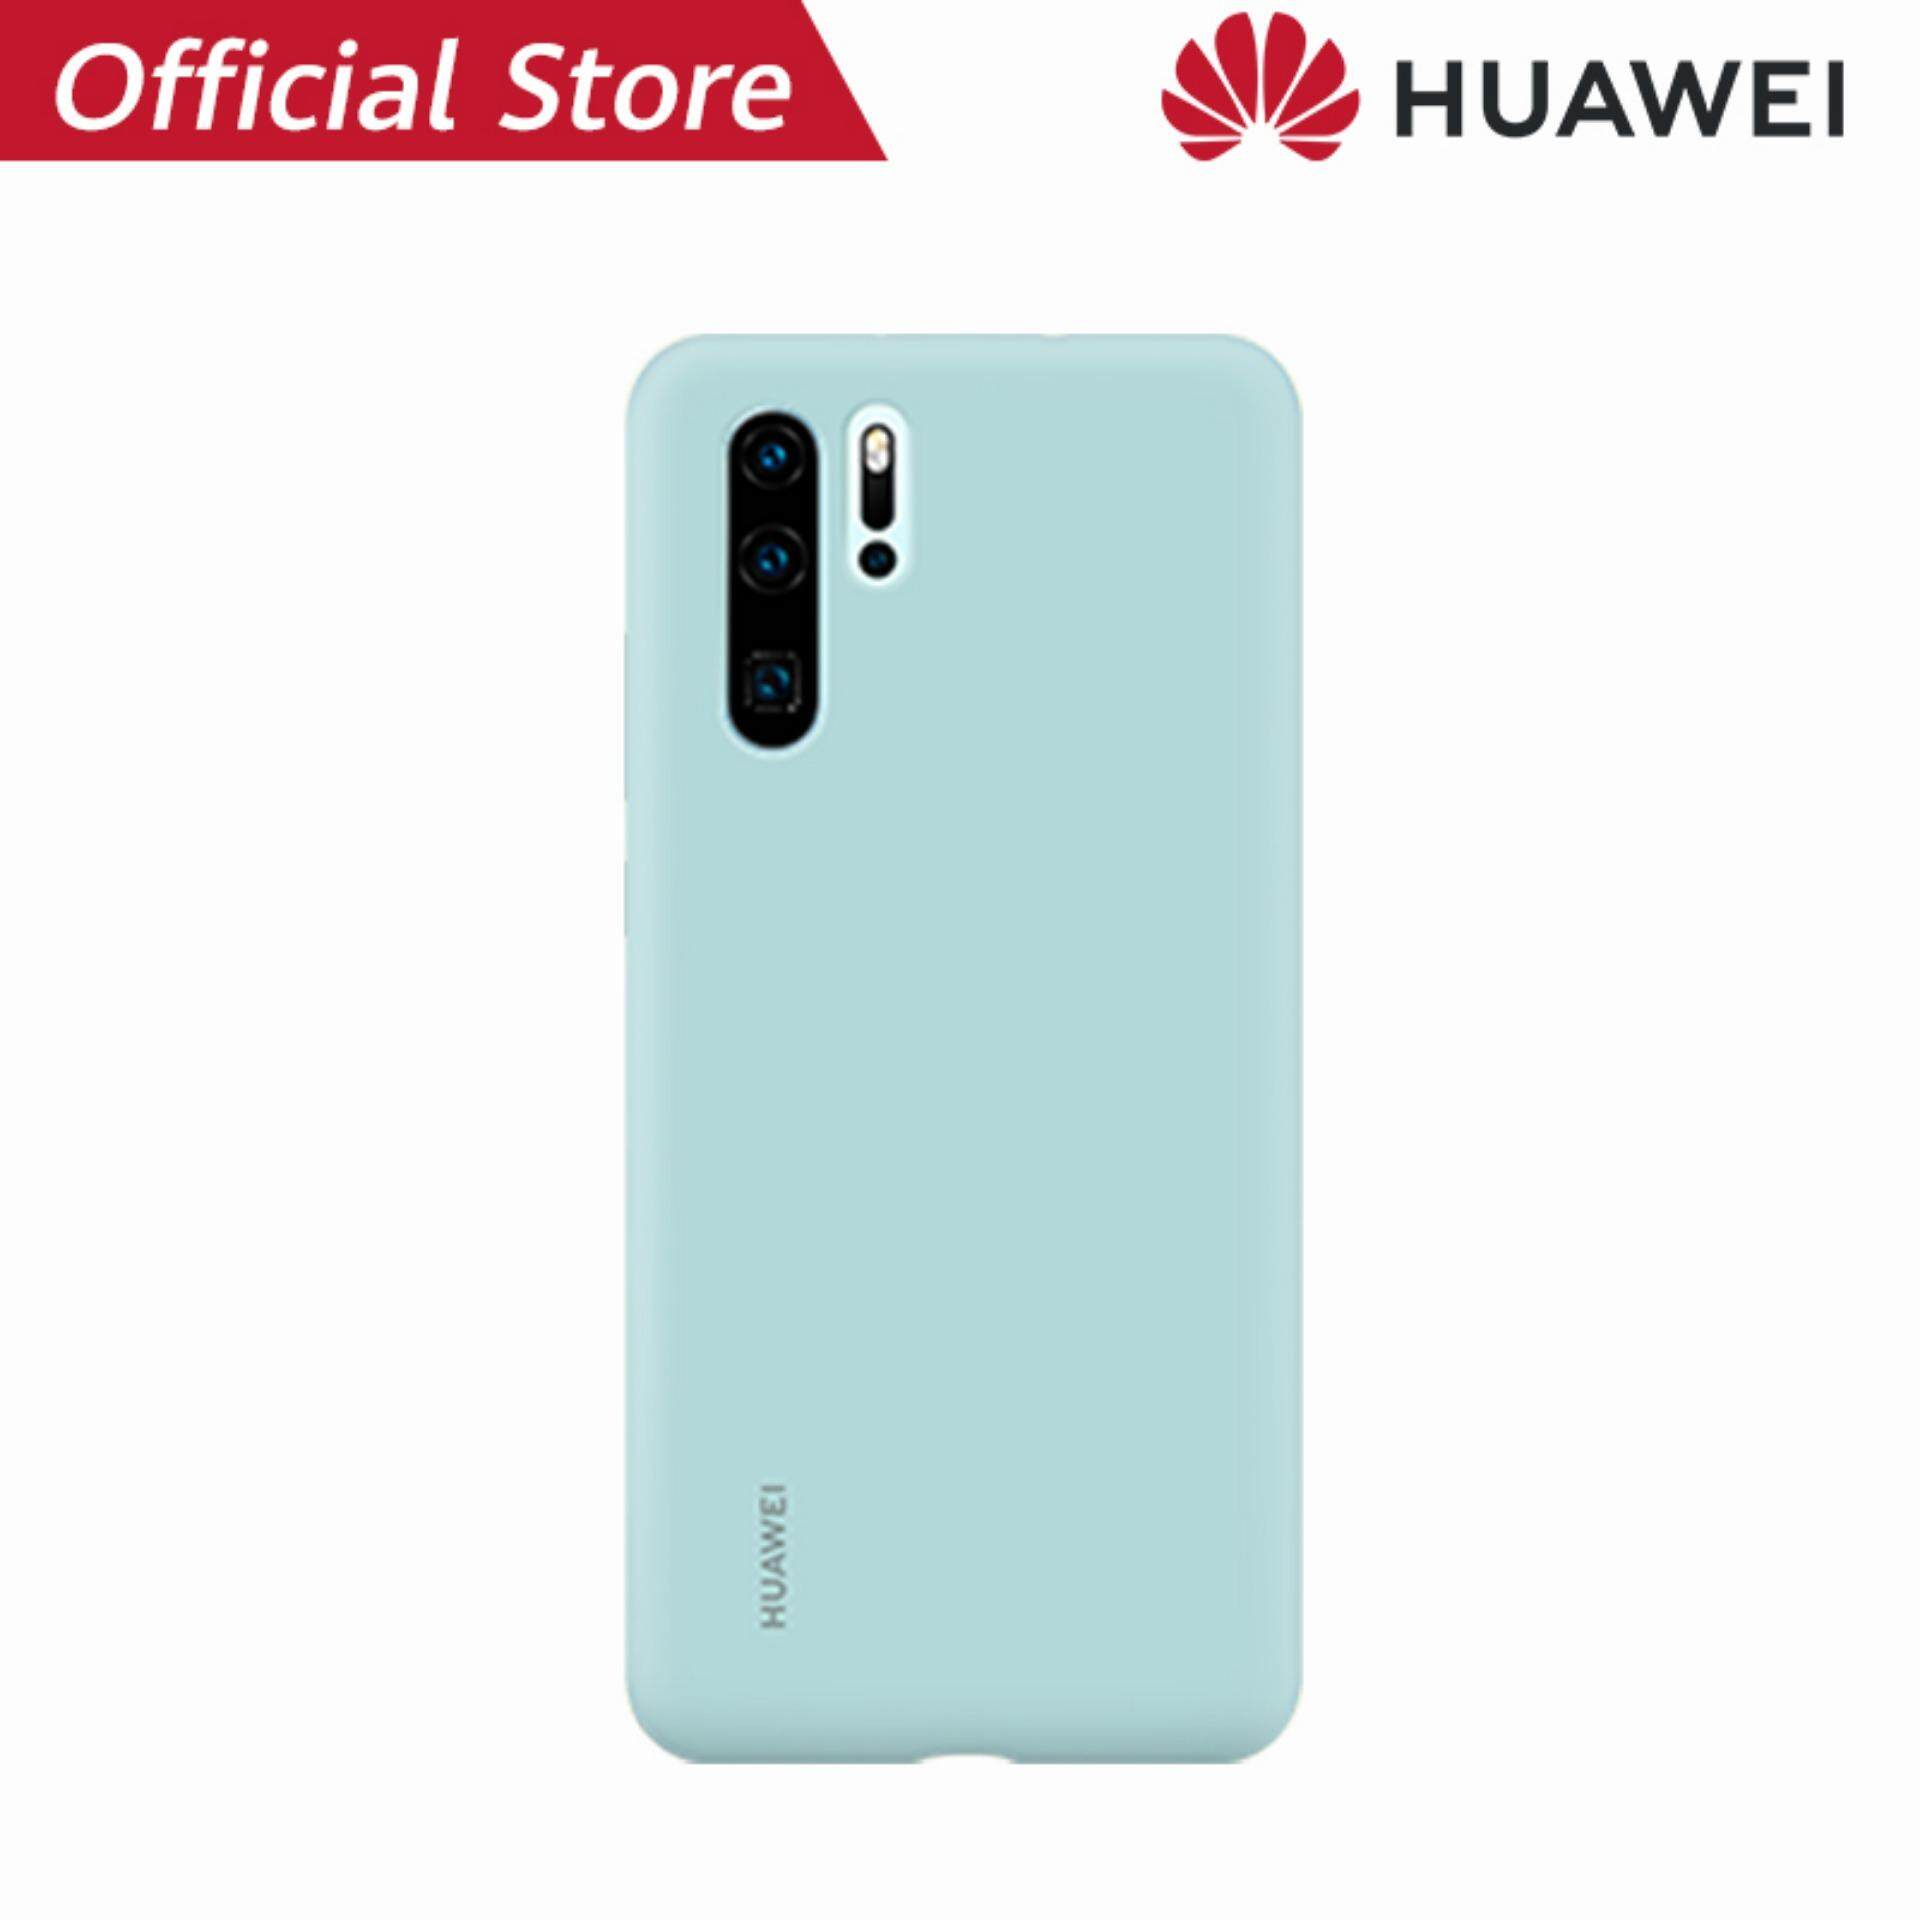 Huawei P30 Pro Silicone Case สำหรับ P30 Pro